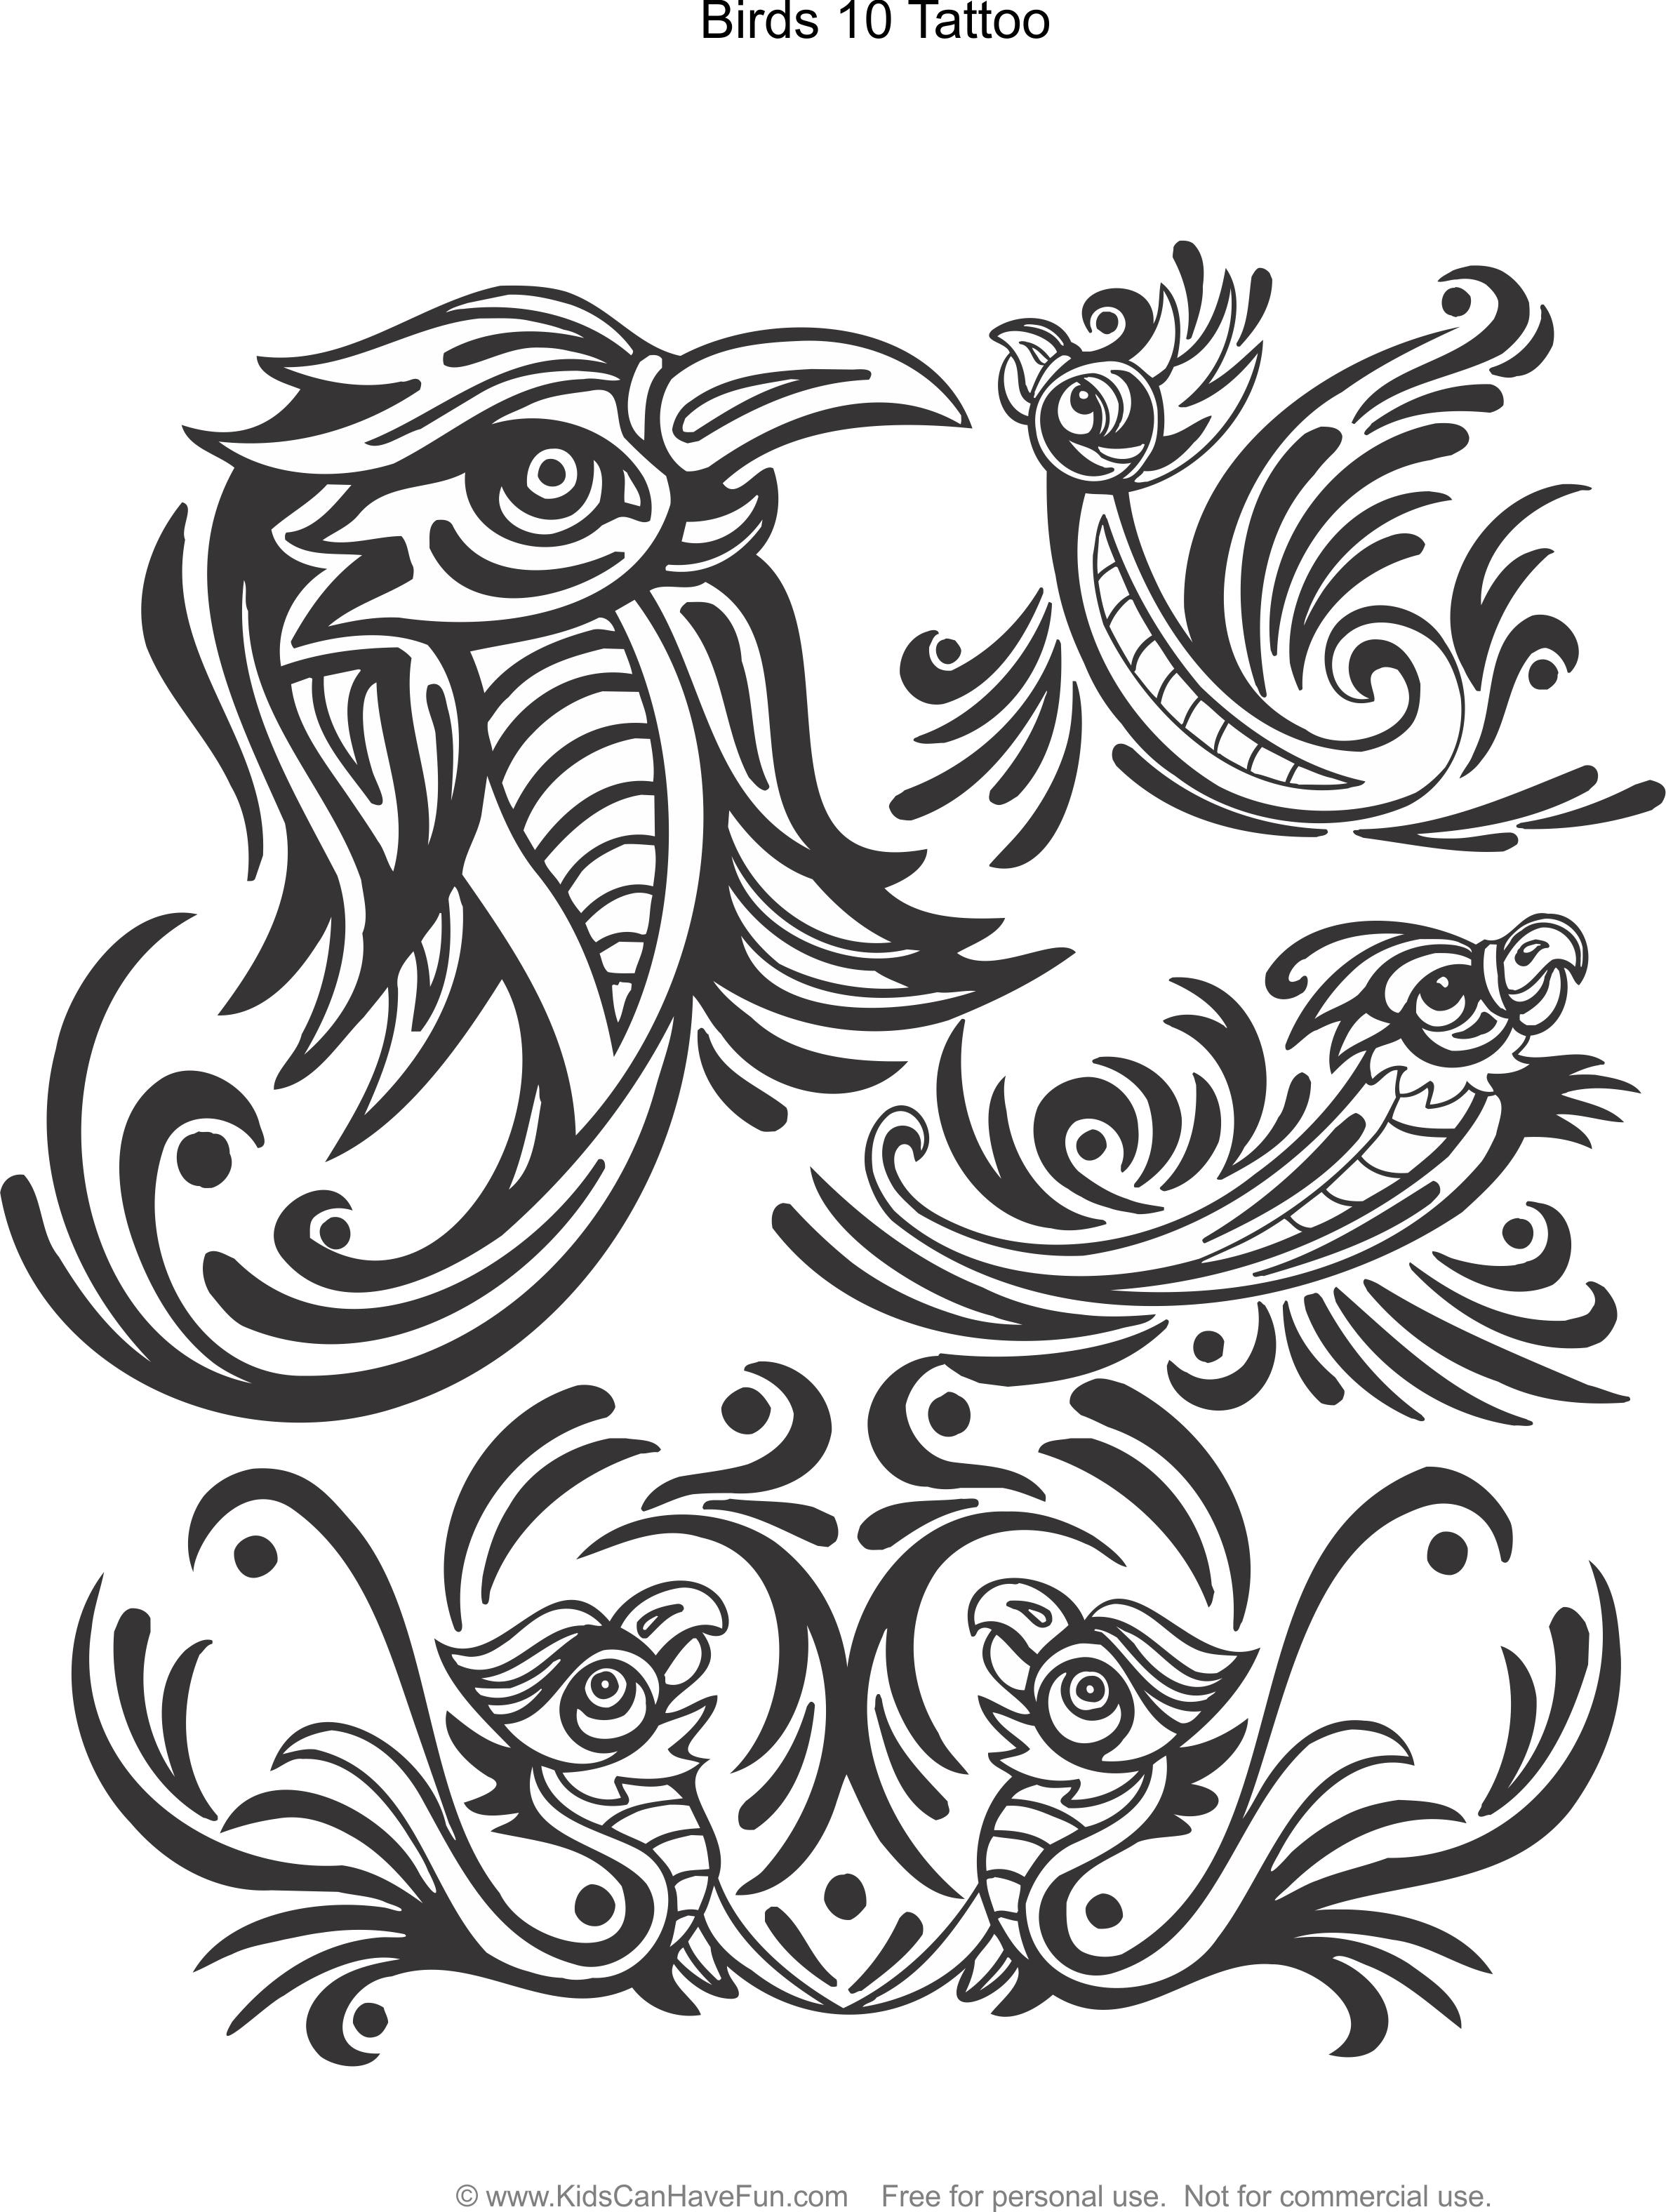 Birds 10 Tattoo Design Coloring Page Kidscanhavefun